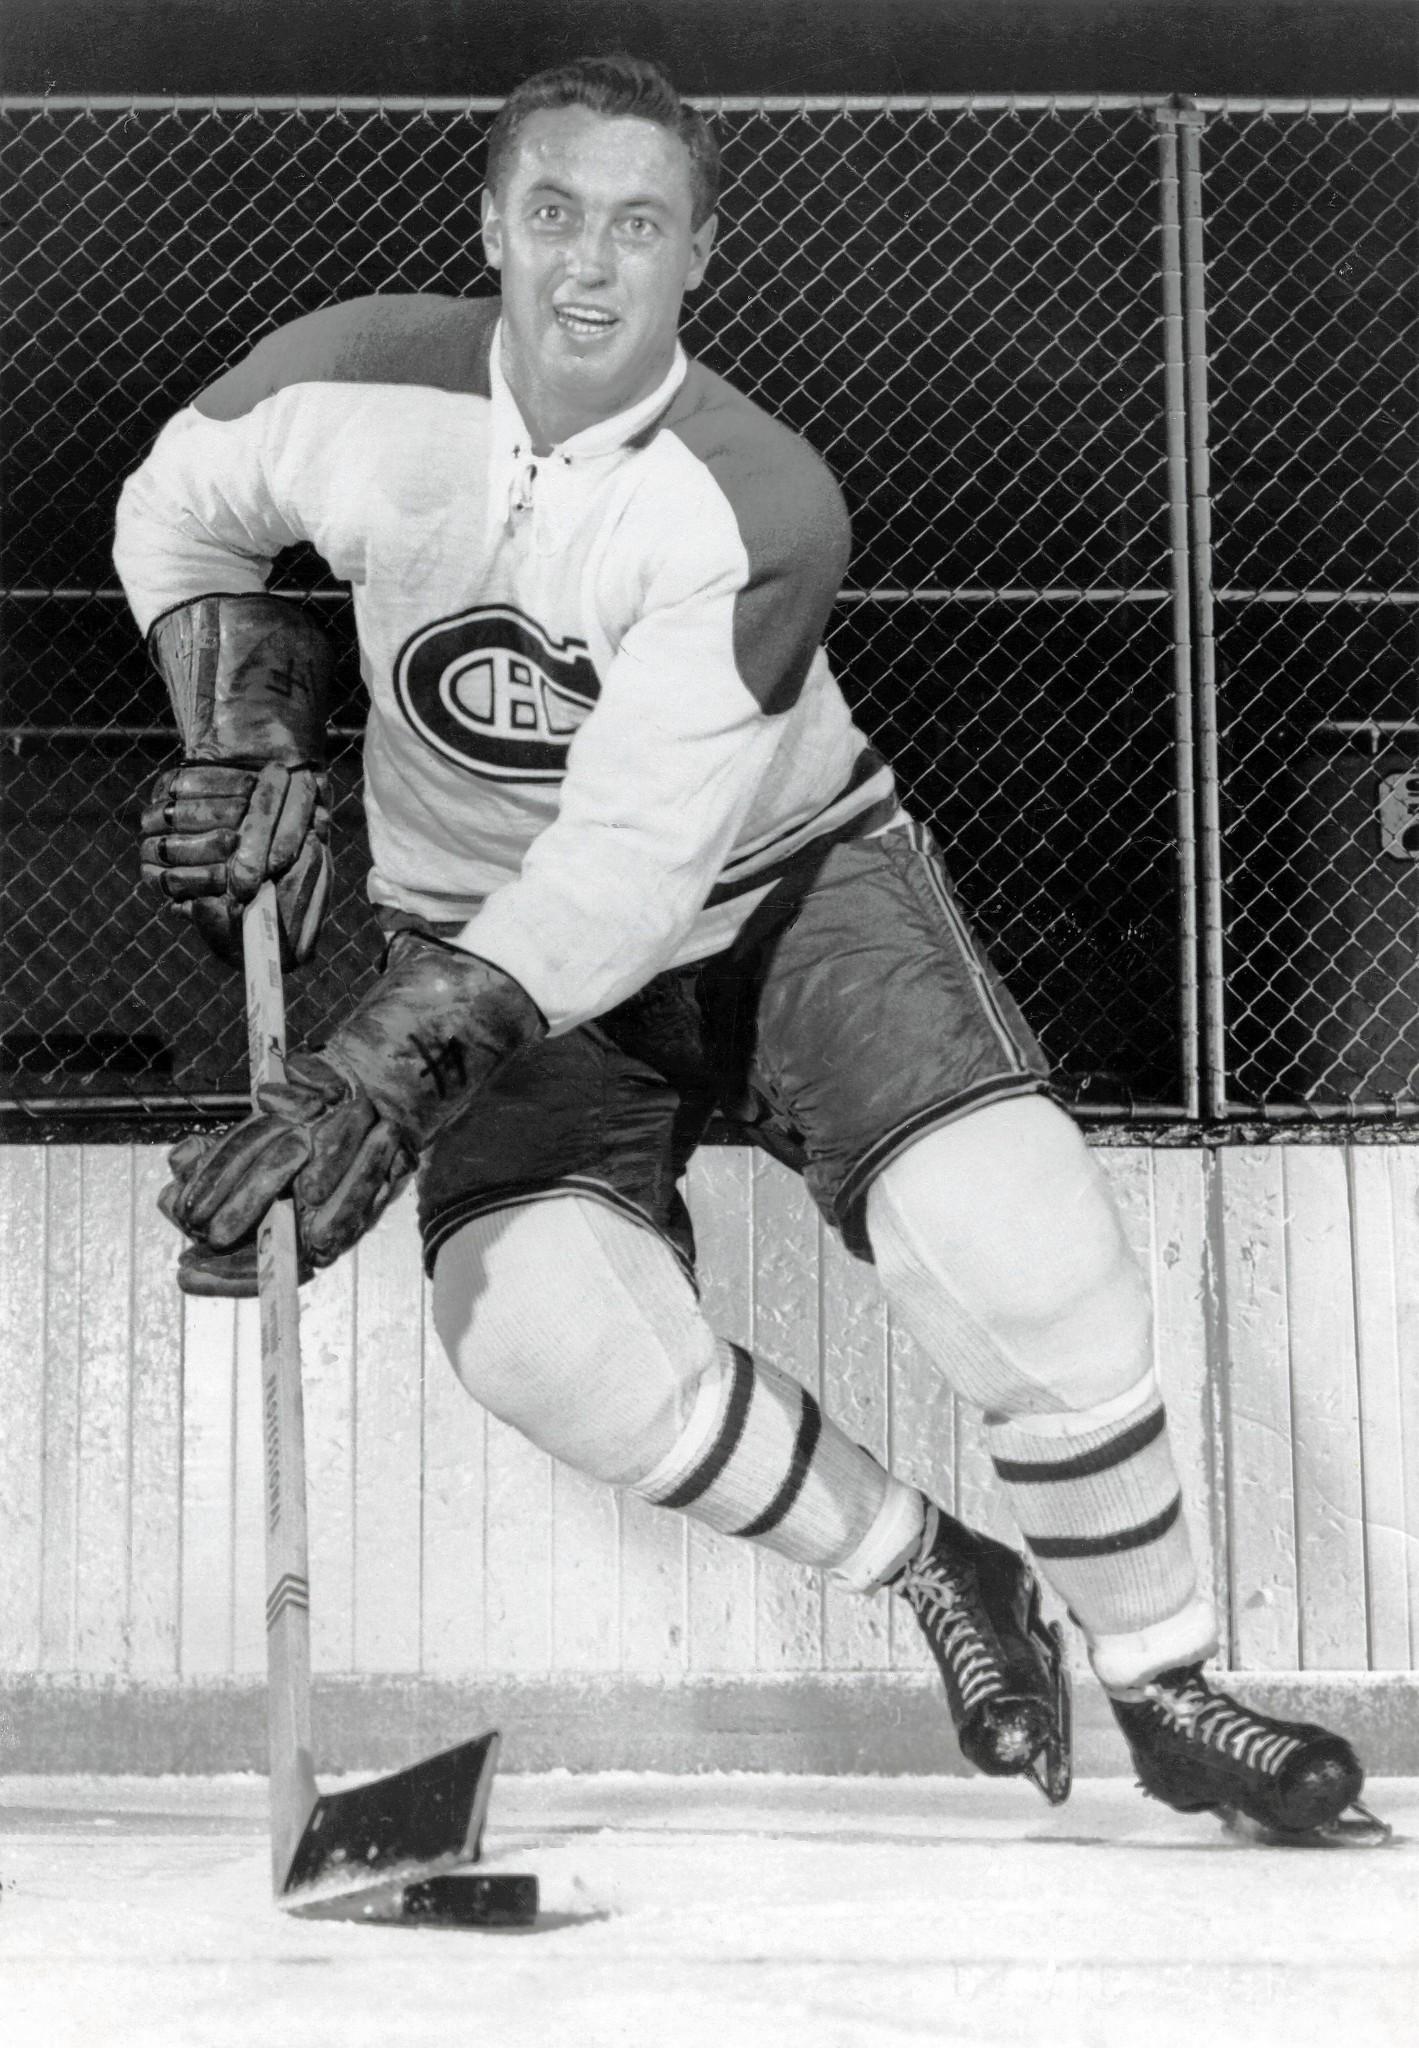 jean beliveau dies at 83 hockey star won 10 stanley cups as a